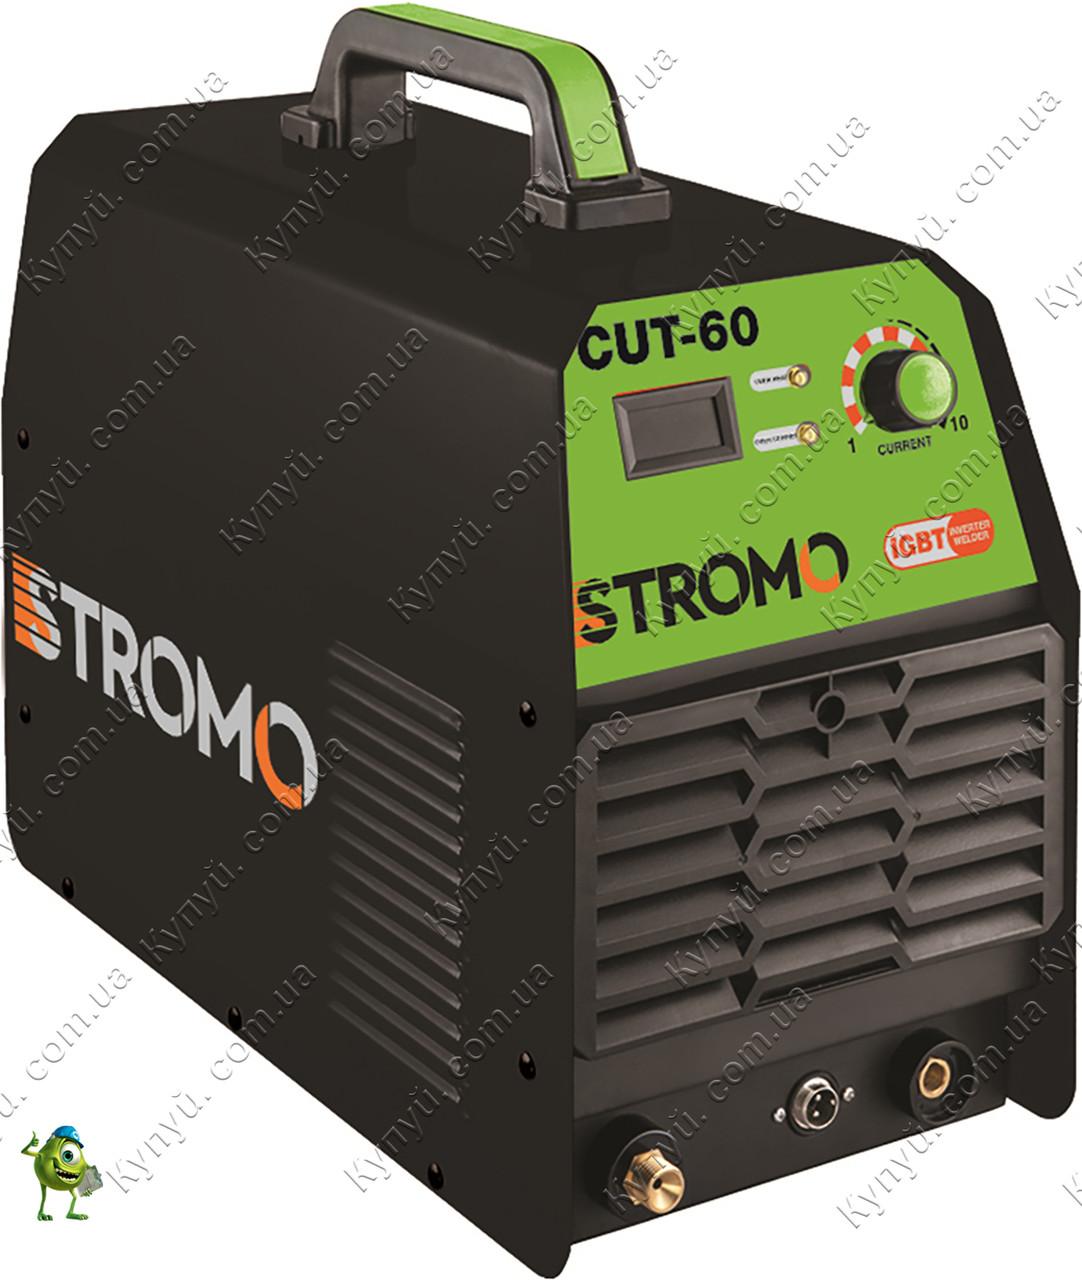 Плазморез Stromo CUT-60